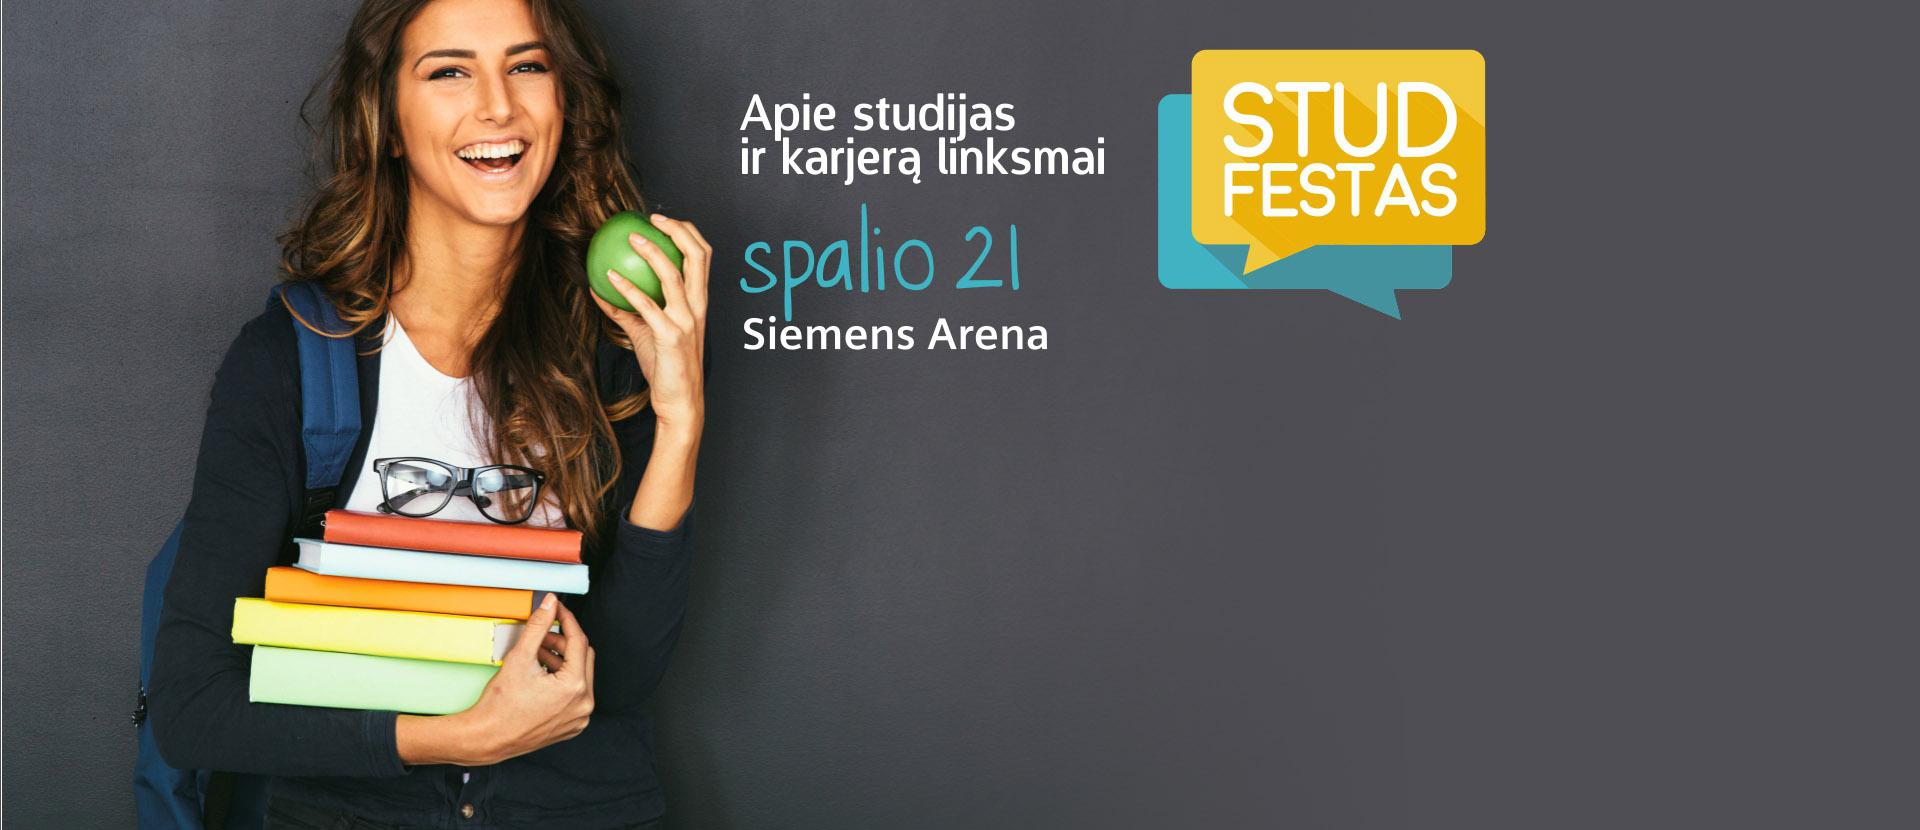 Studfestas - konferencija apie studijas ir karjerą